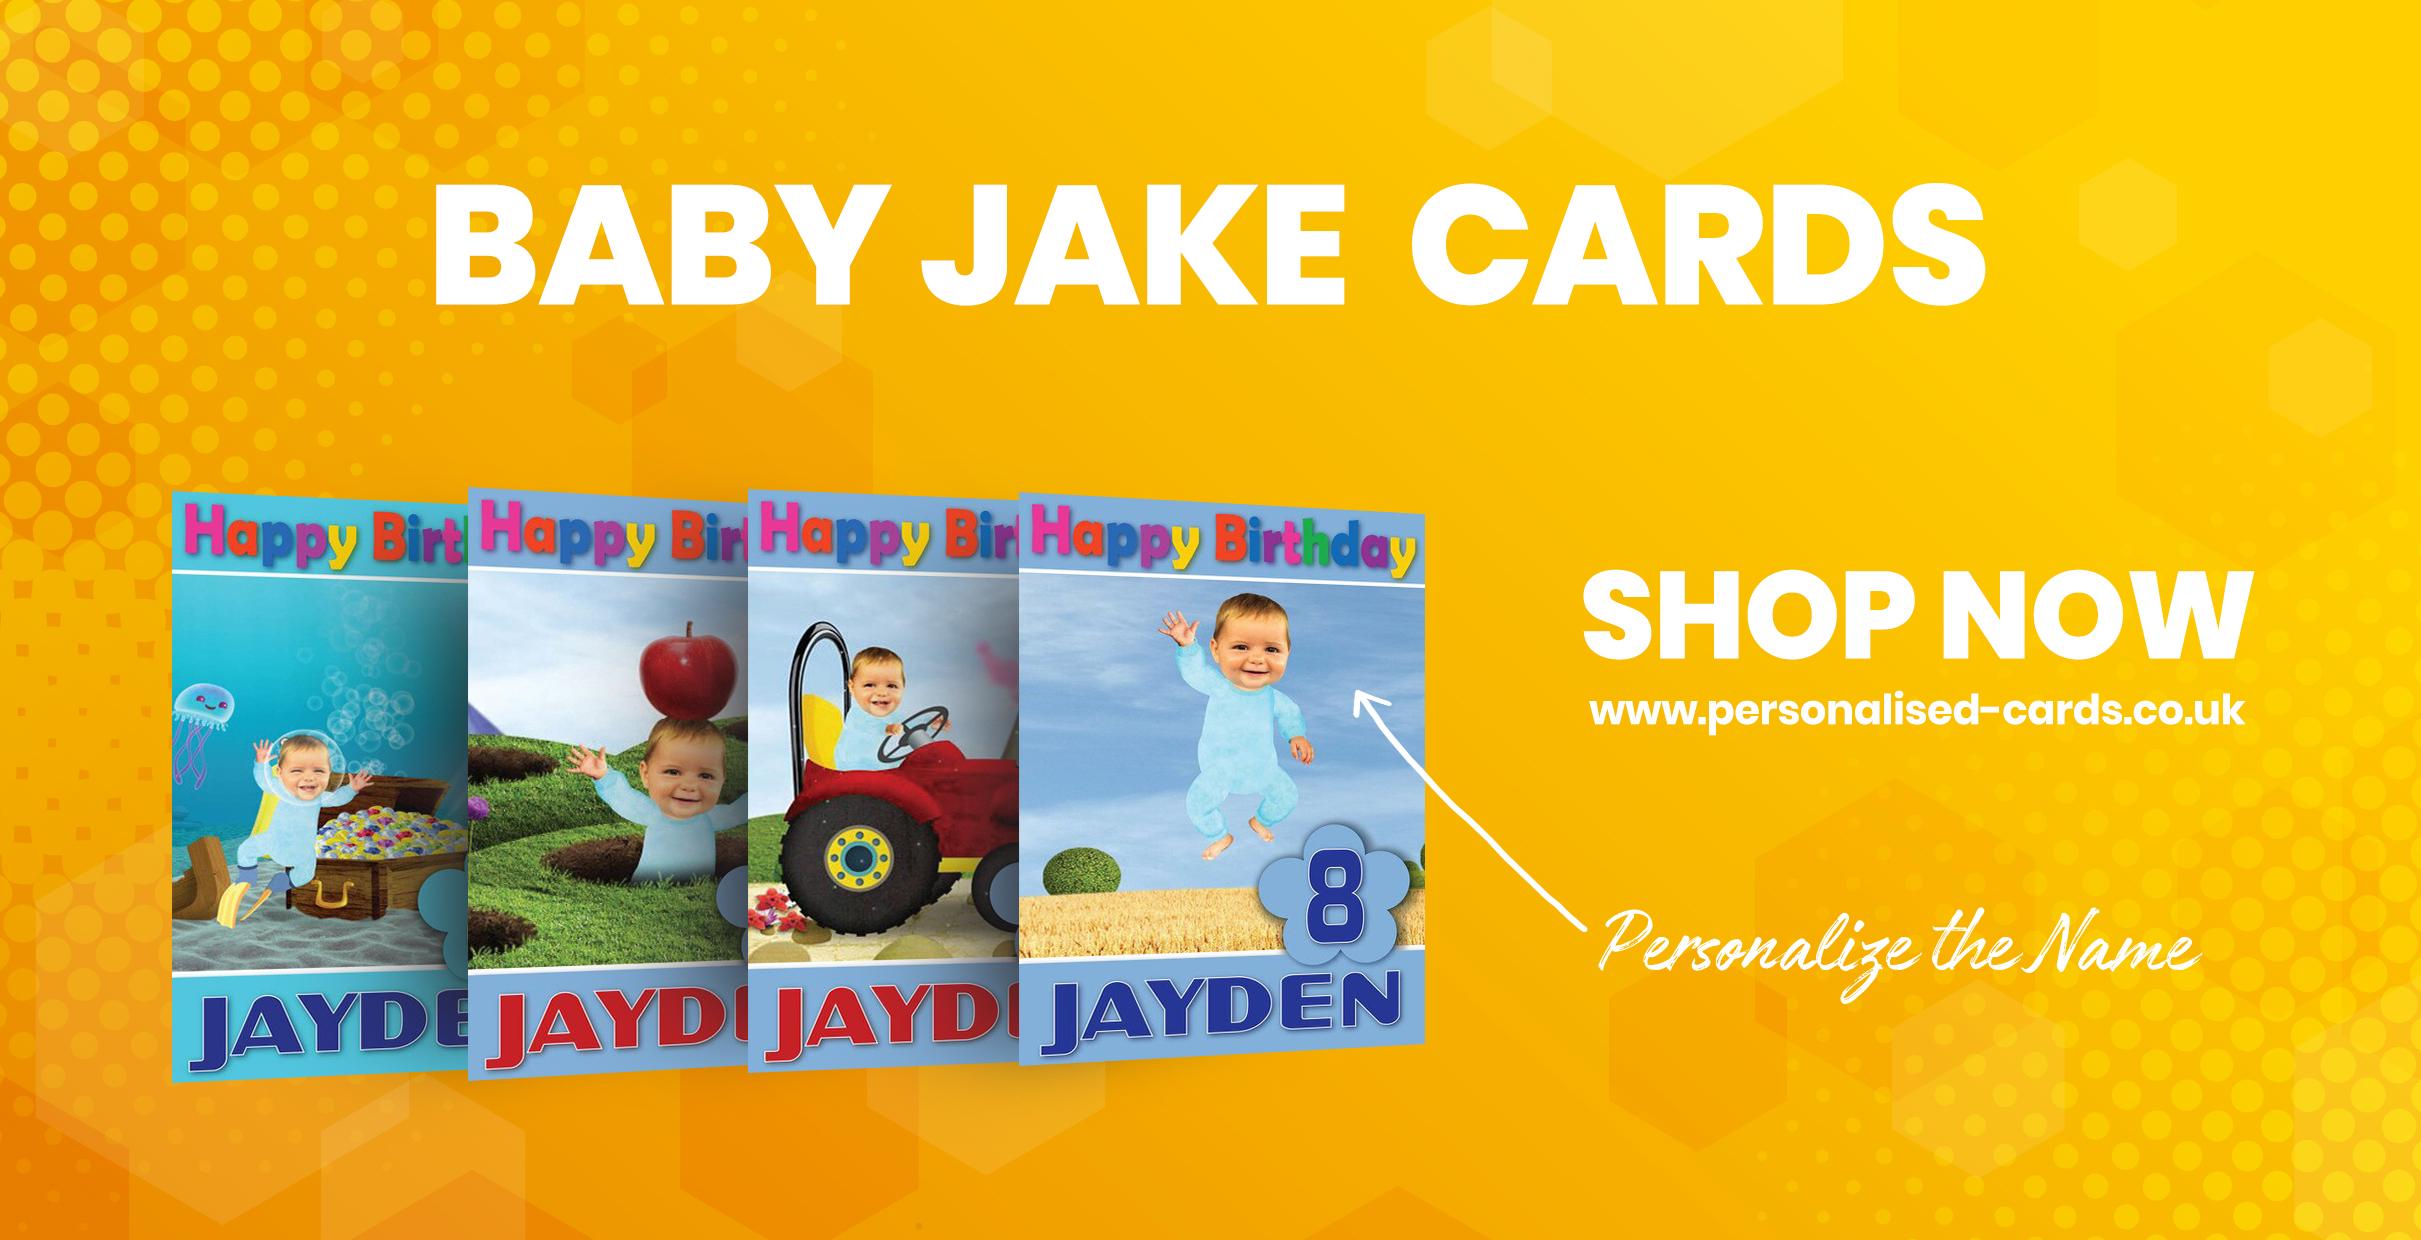 baby-jake-cards.jpg